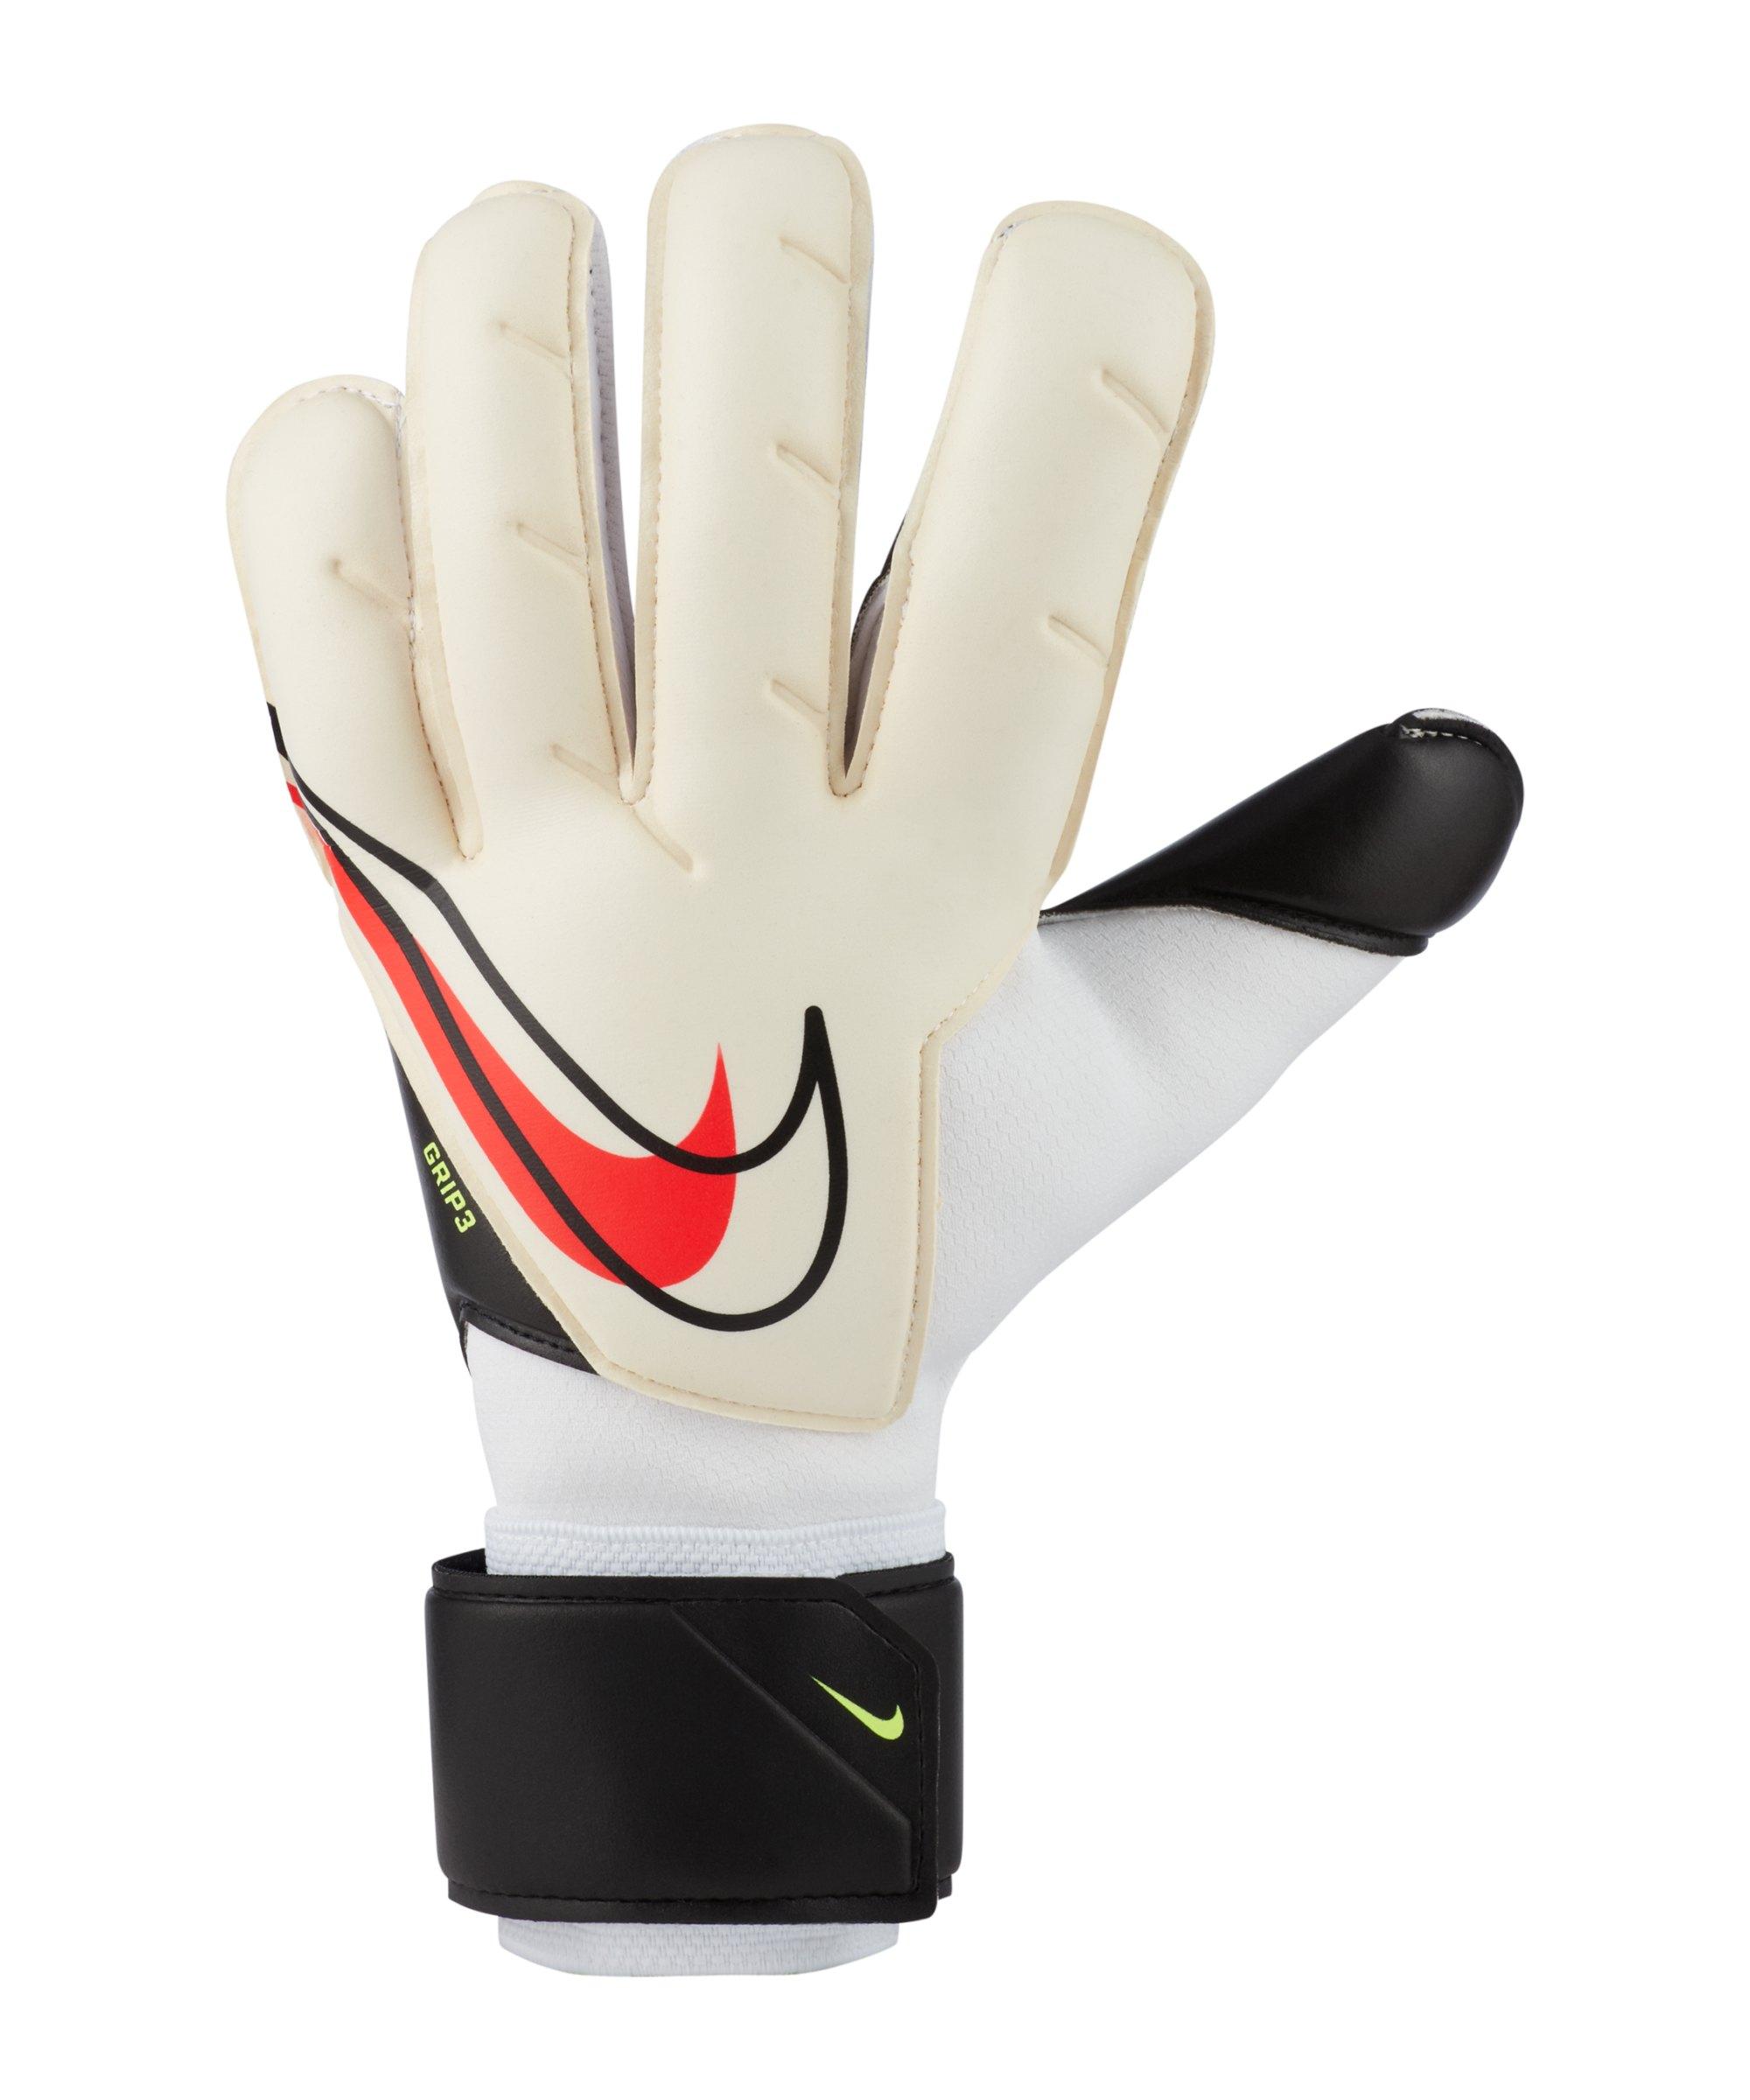 Nike Grip3 Torwarthandschuh Weiss Schwarz Rot F101 - weiss